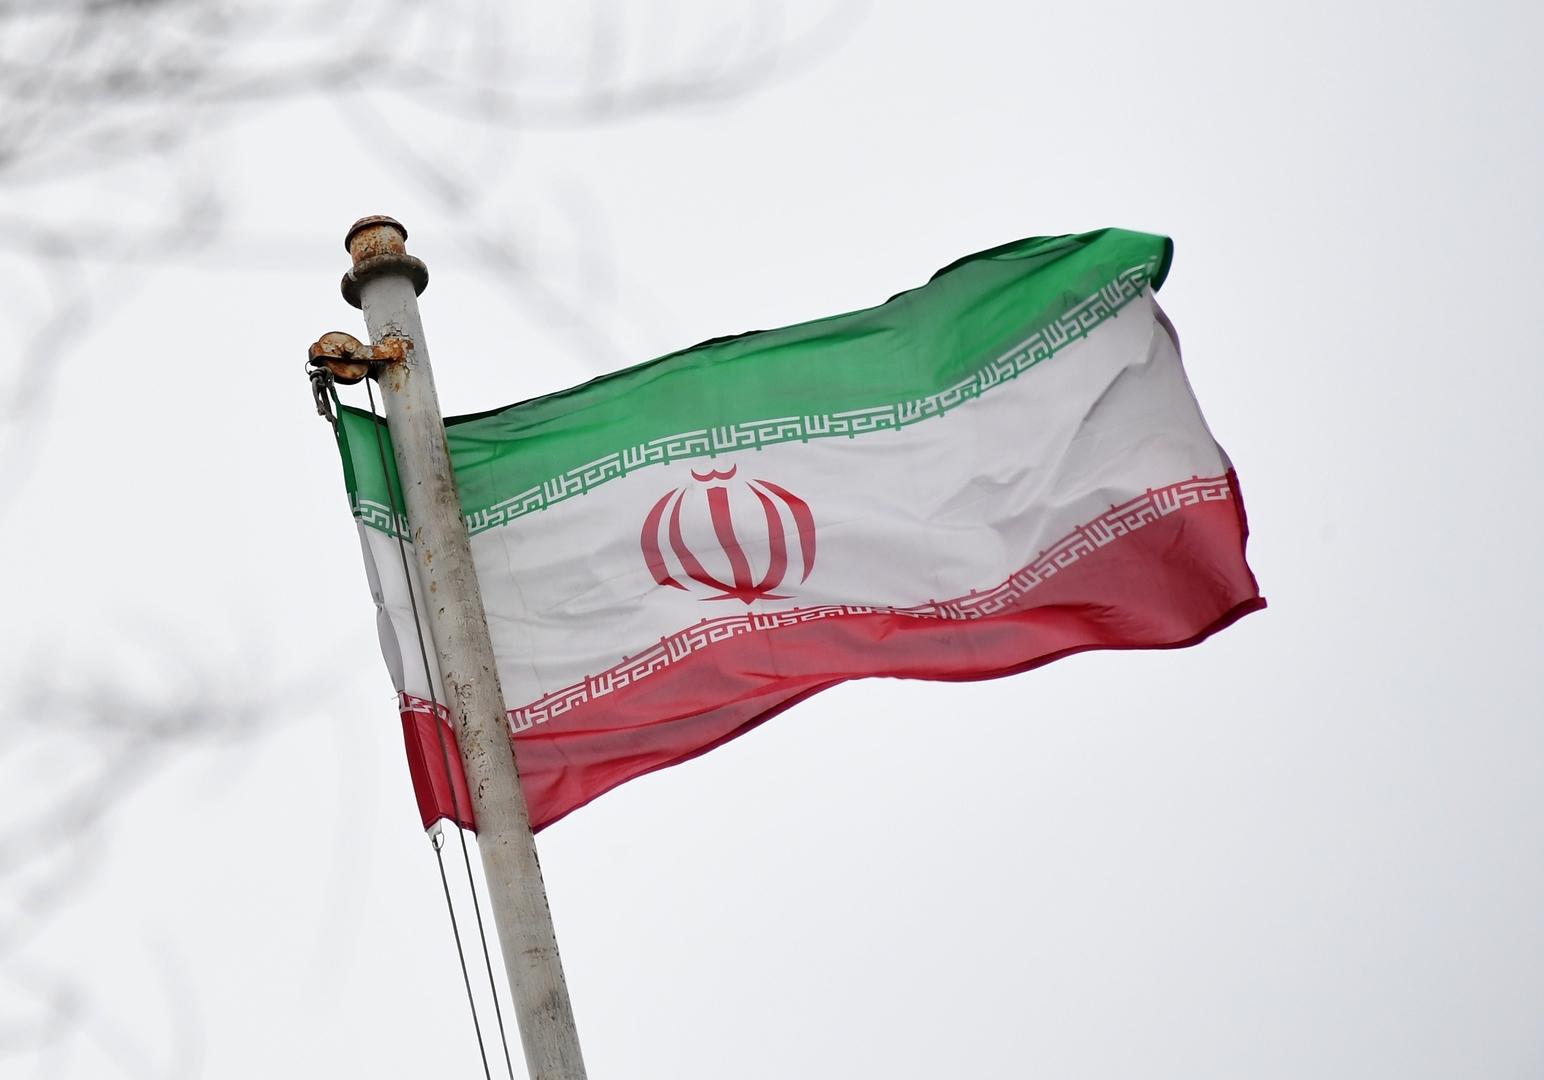 إيران تعلن تسلمها خطاب ضمان لقرض روسي بـ 1.2 مليار يورو لبناء محطة كهربائية